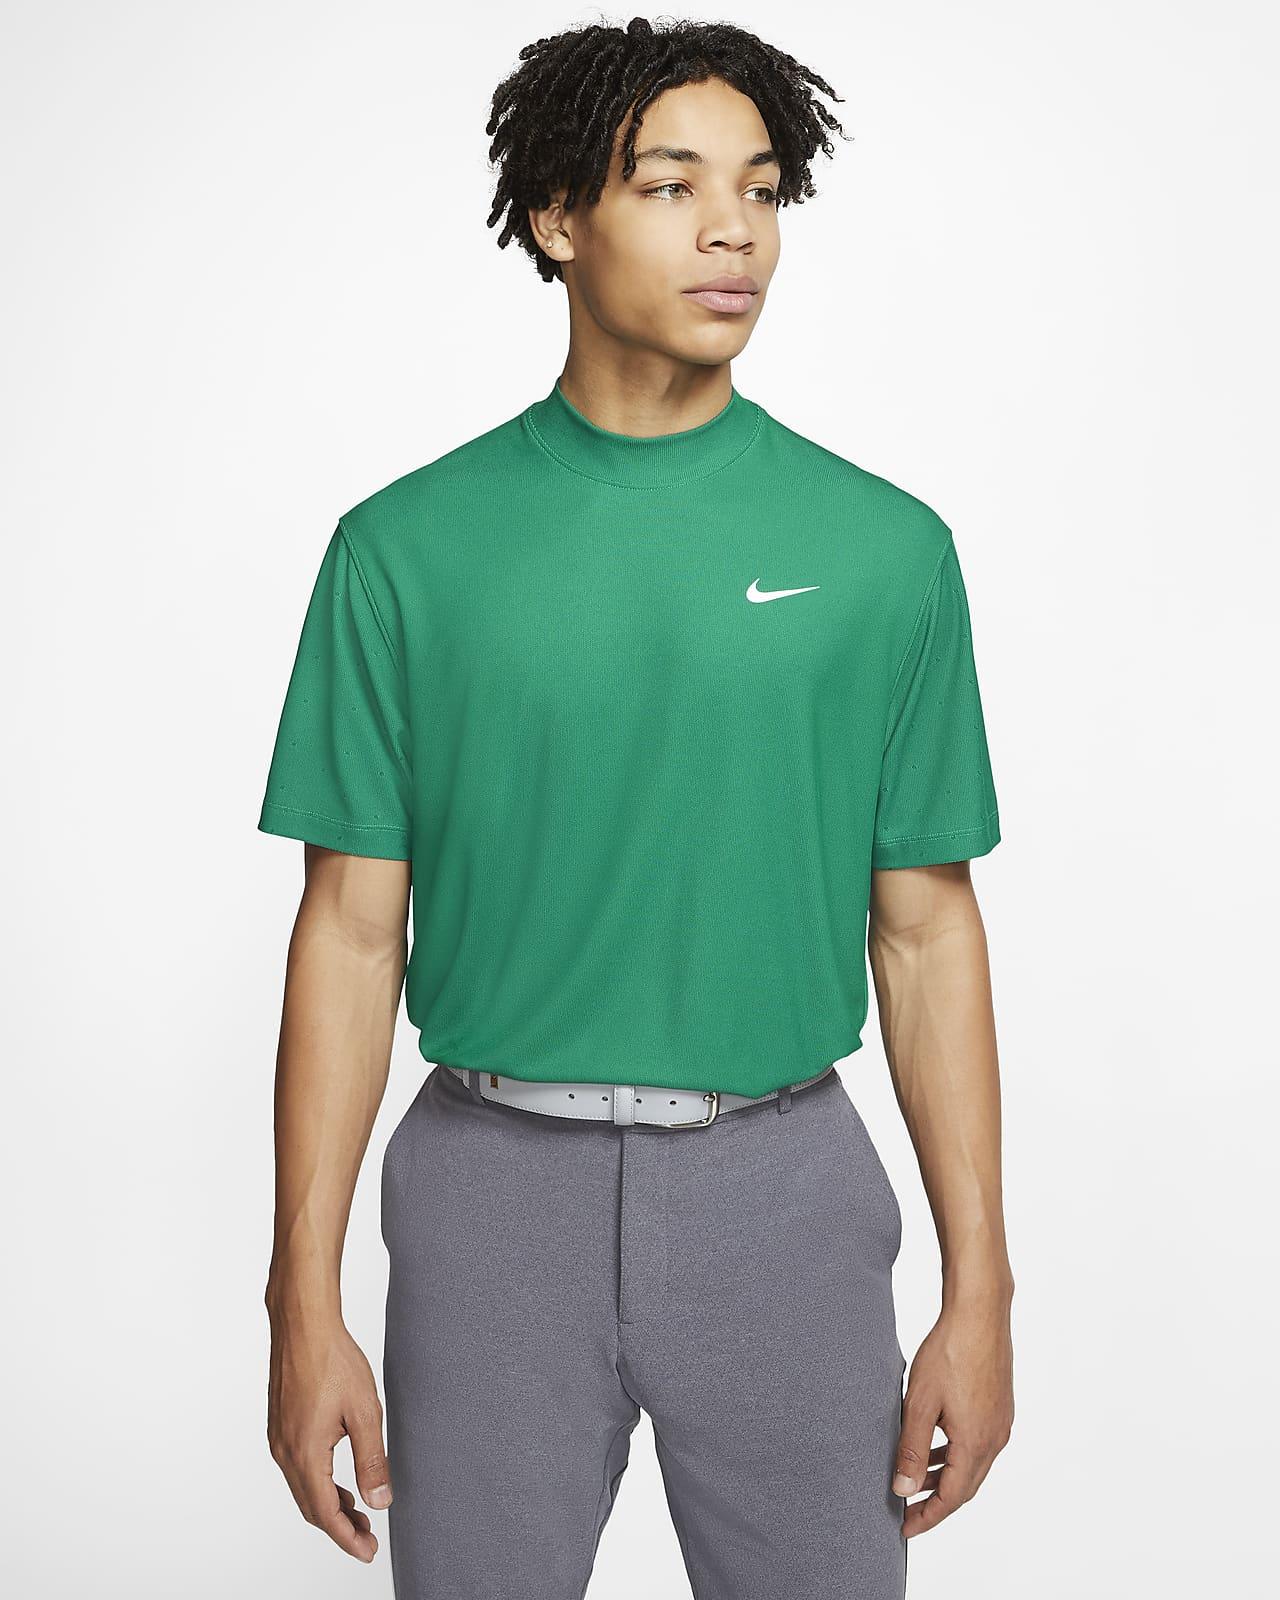 Nike Dri-FIT Tiger Woods Men's Mock-Neck Golf Top